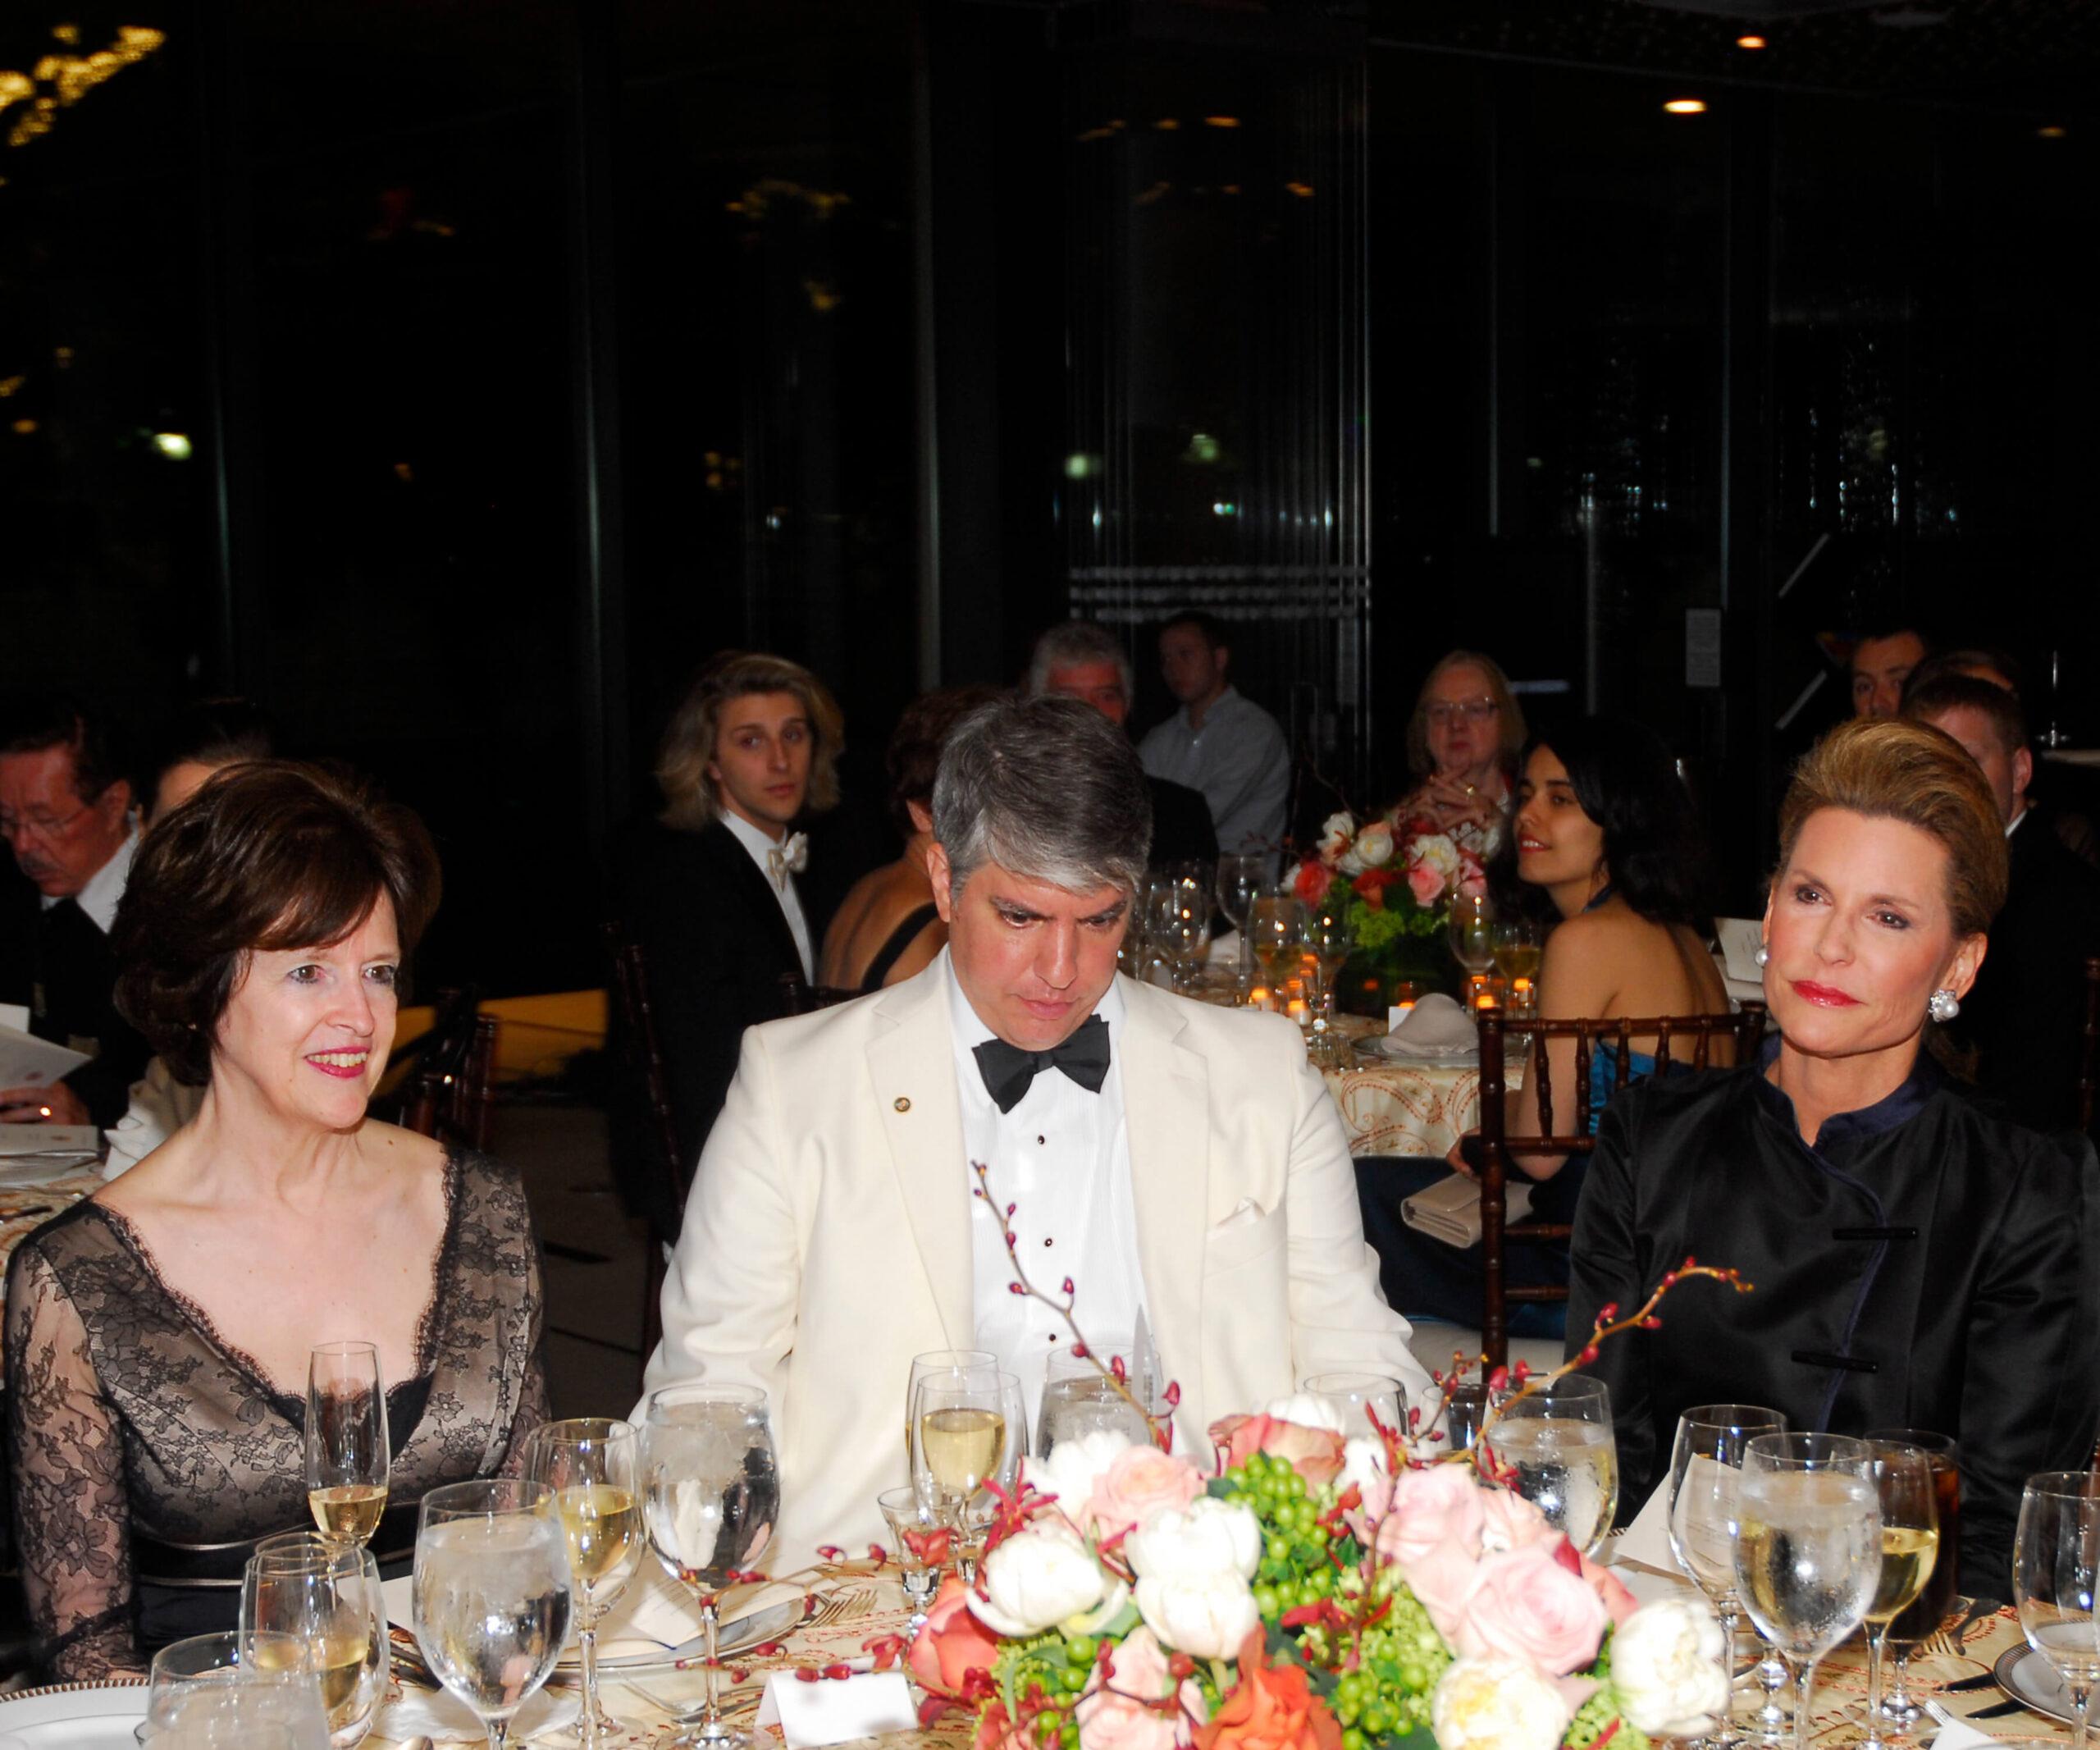 Ambassador April Foley; Max Teleki – President of the Hungarian American Coalition; Ambassador Nancy G. Brinker